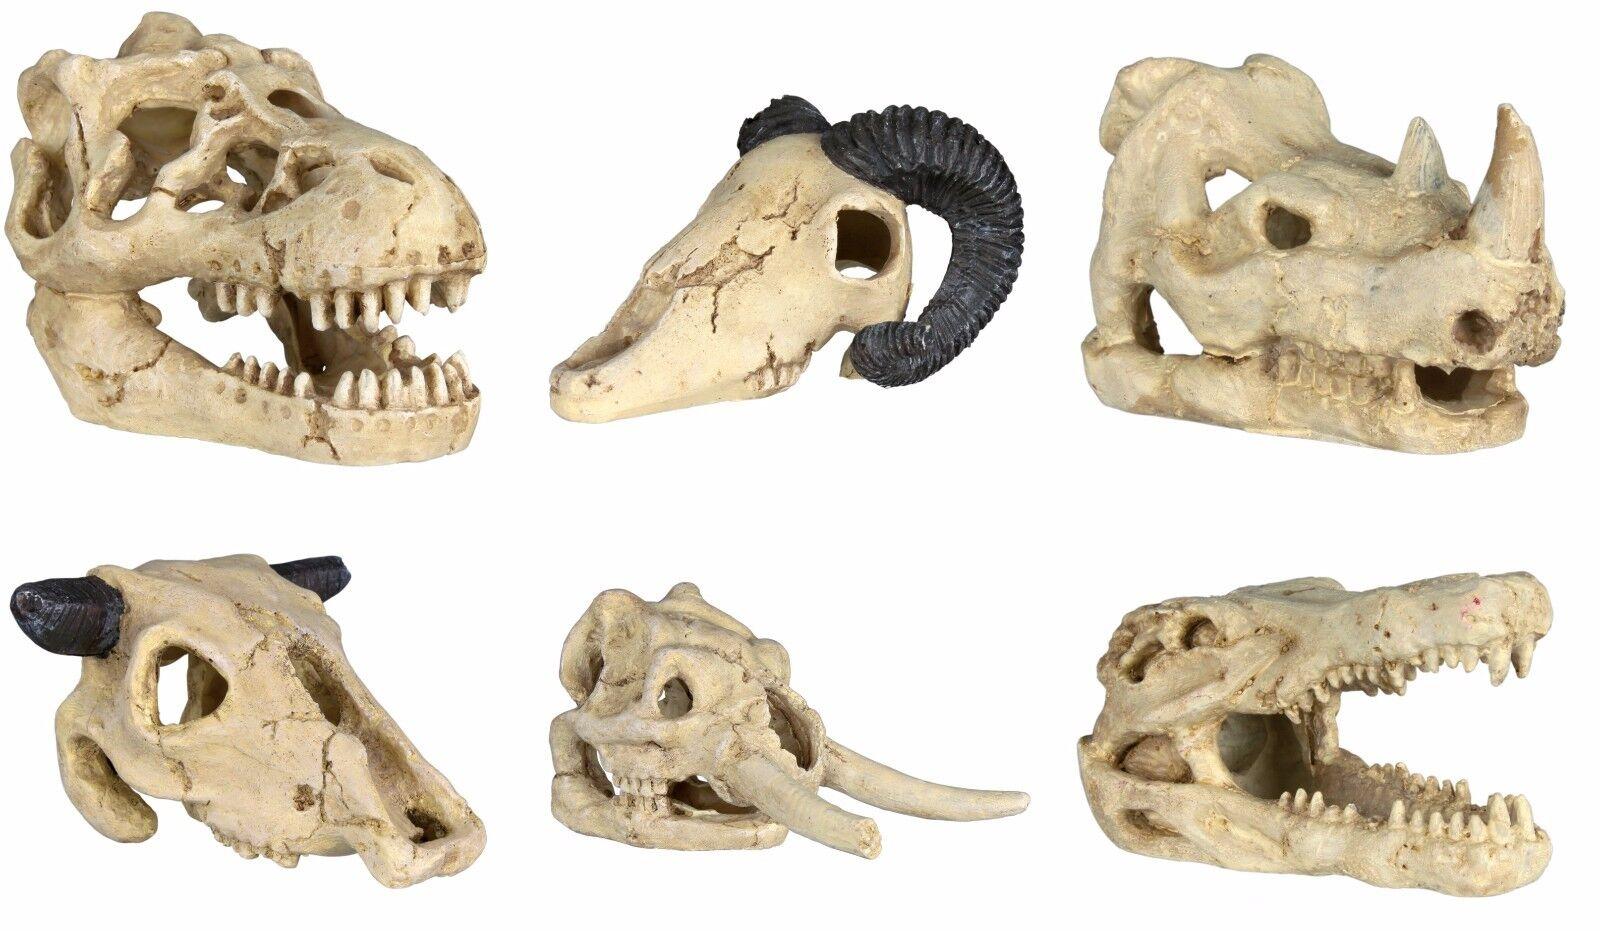 6 Pcs Skull Fossil Decor Ornament Decoration for Fish Tank Aquarium by TRIXIE